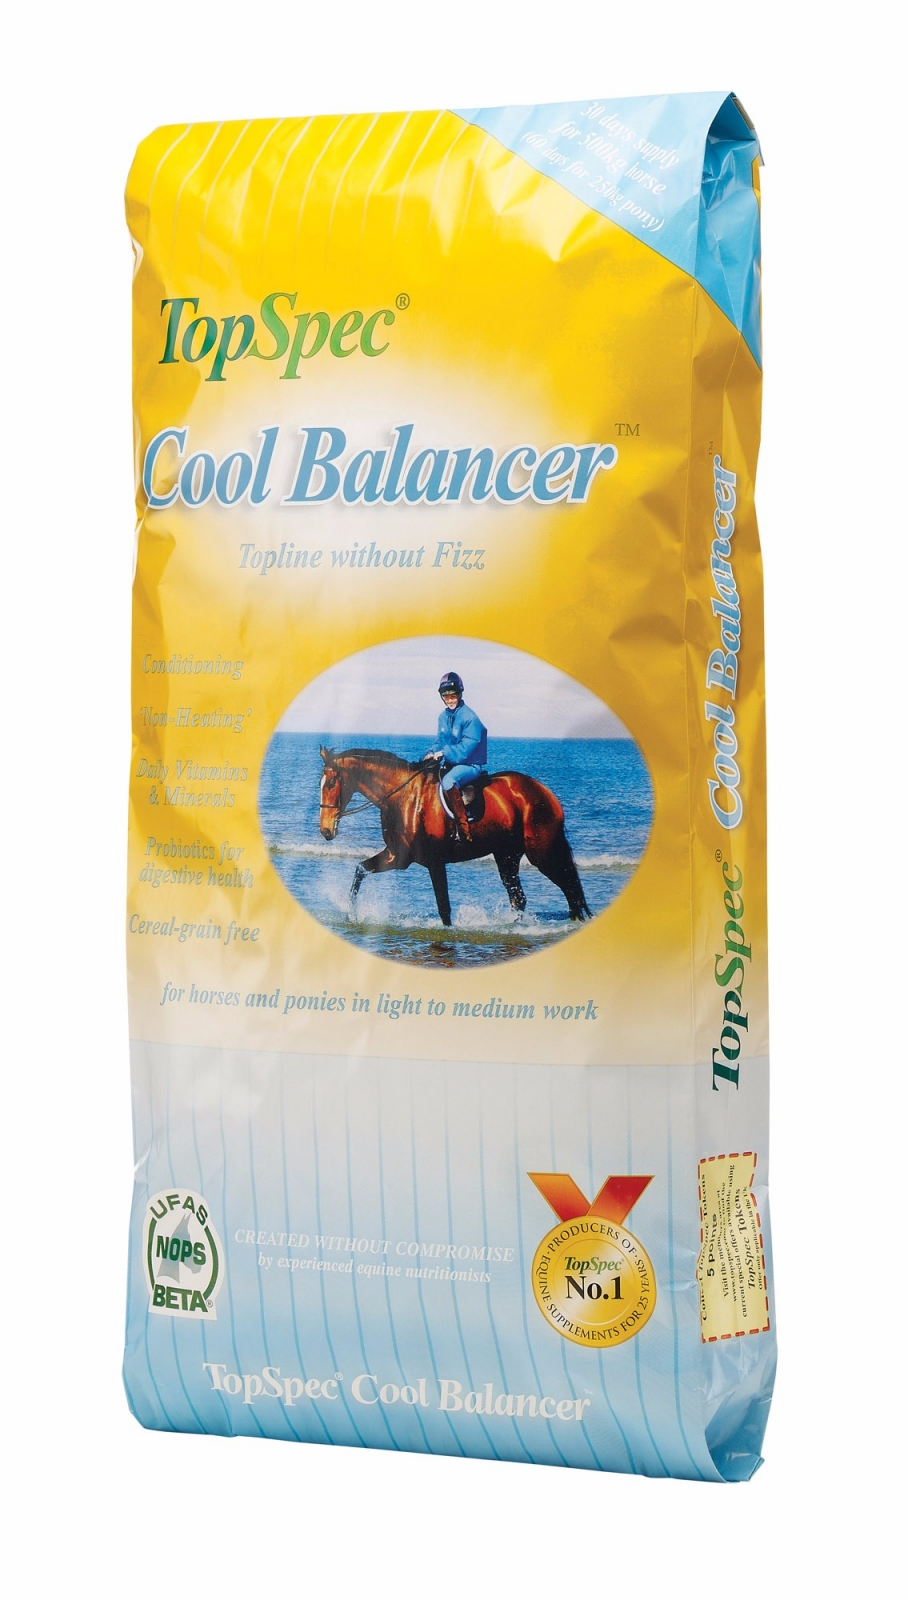 TopSpec Cool Balancer